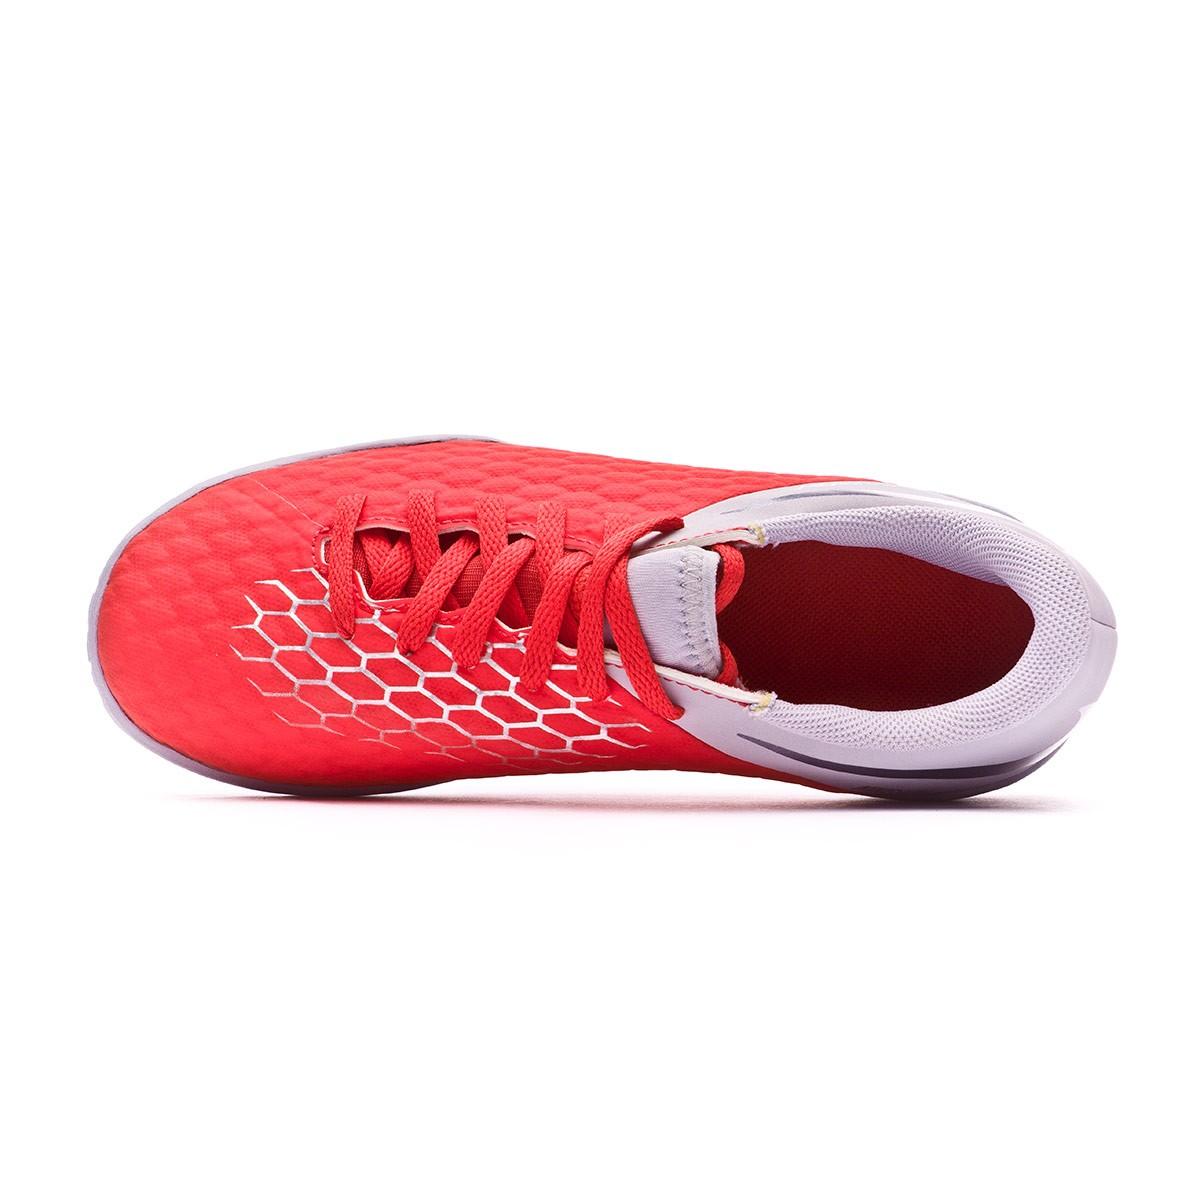 63f4d6f0fb5 Futsal Boot Nike Kids Hypervenom PhantomX III Academy IC Light  crimson-Metallic dark grey-Wolf grey - Football store Fútbol Emotion